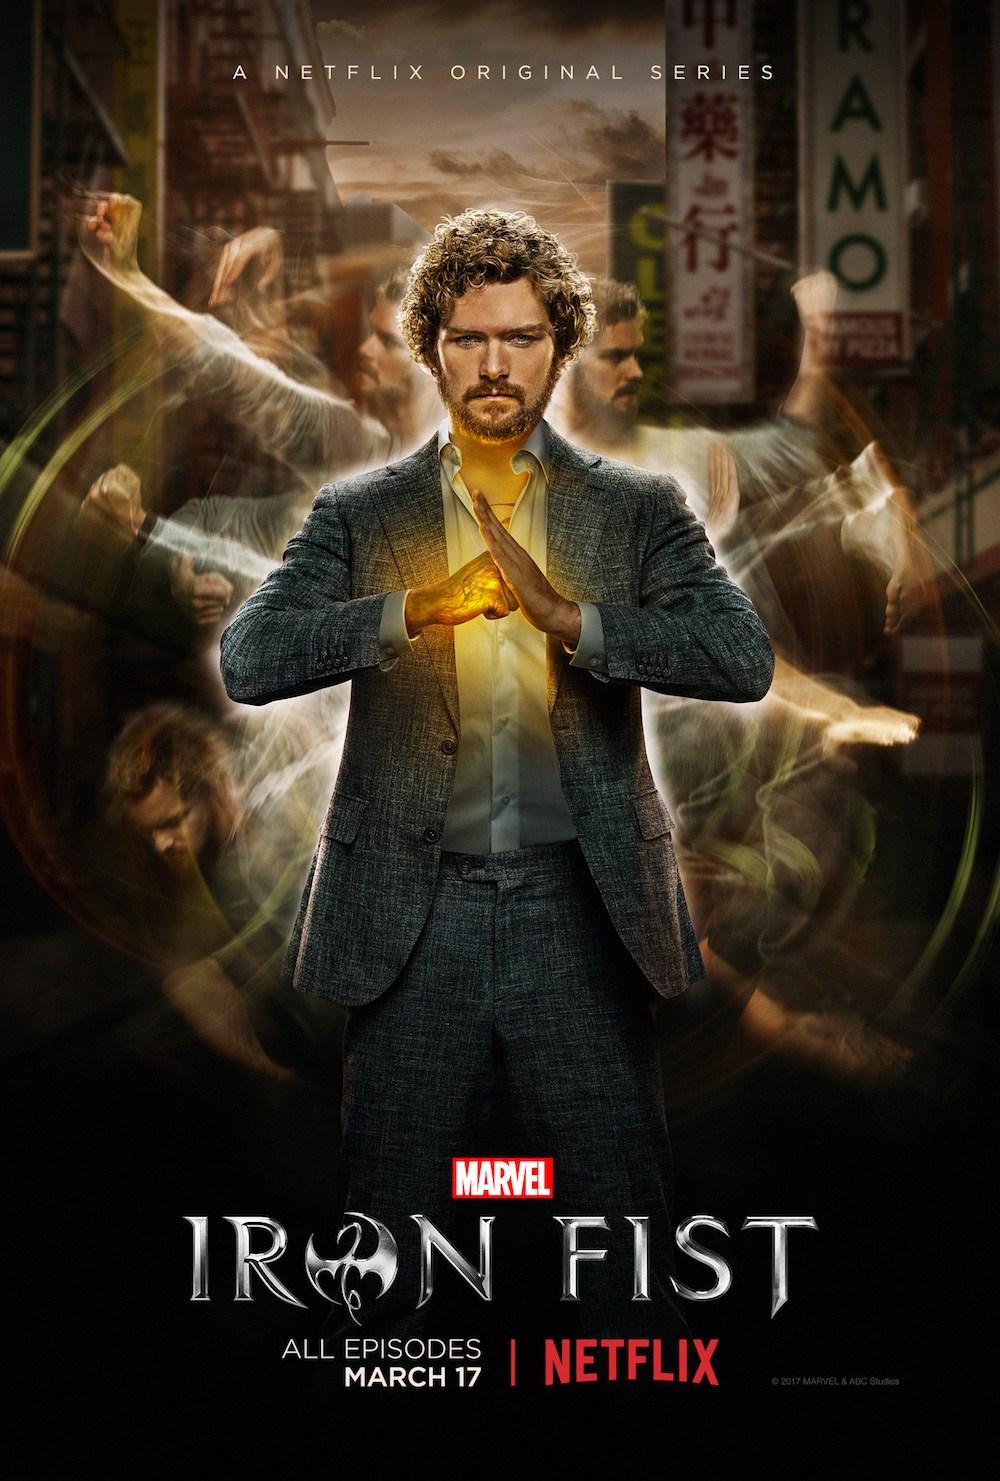 Marvel's Iron Fist featurette poster